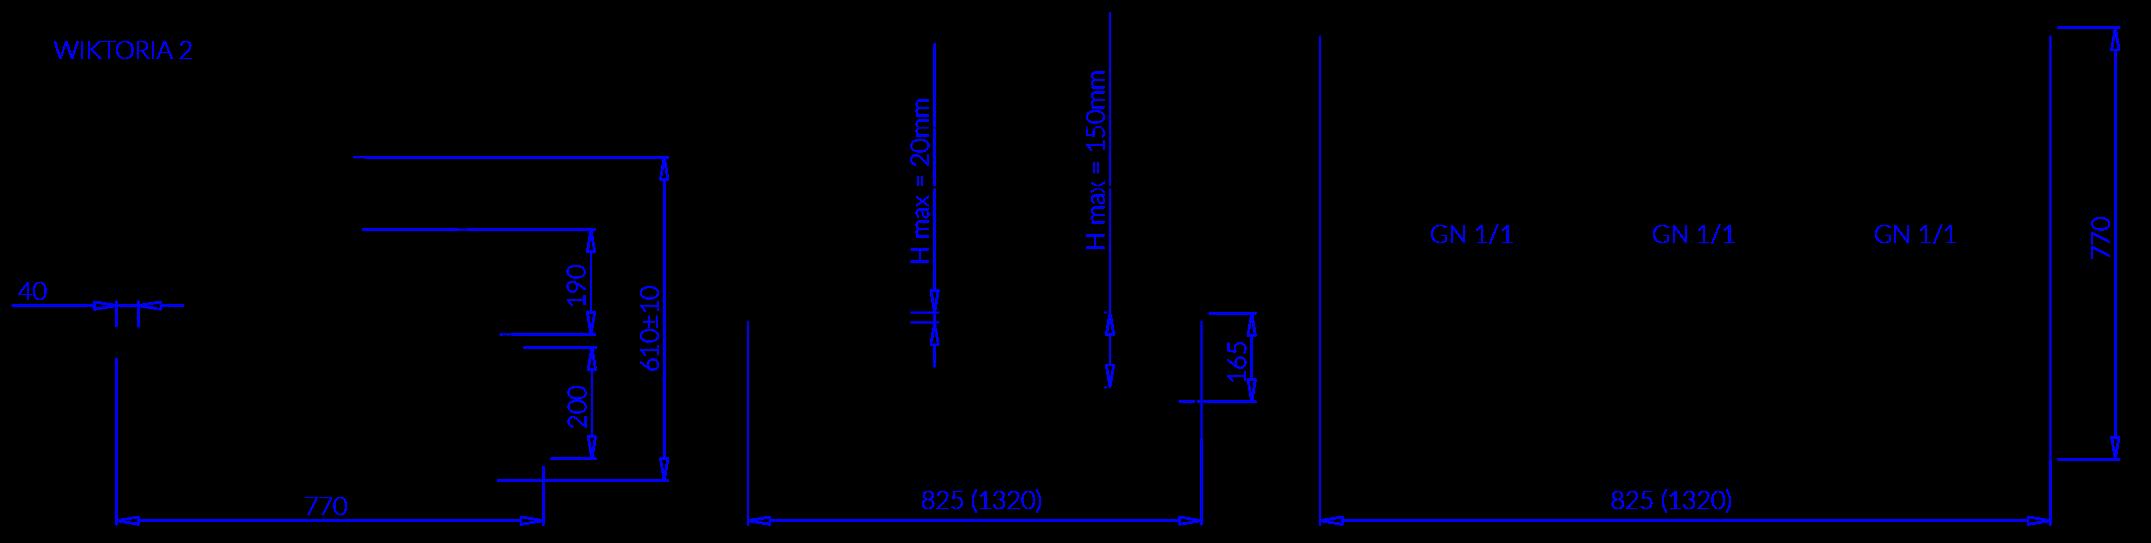 Технический чертеж WIKTORIA 2